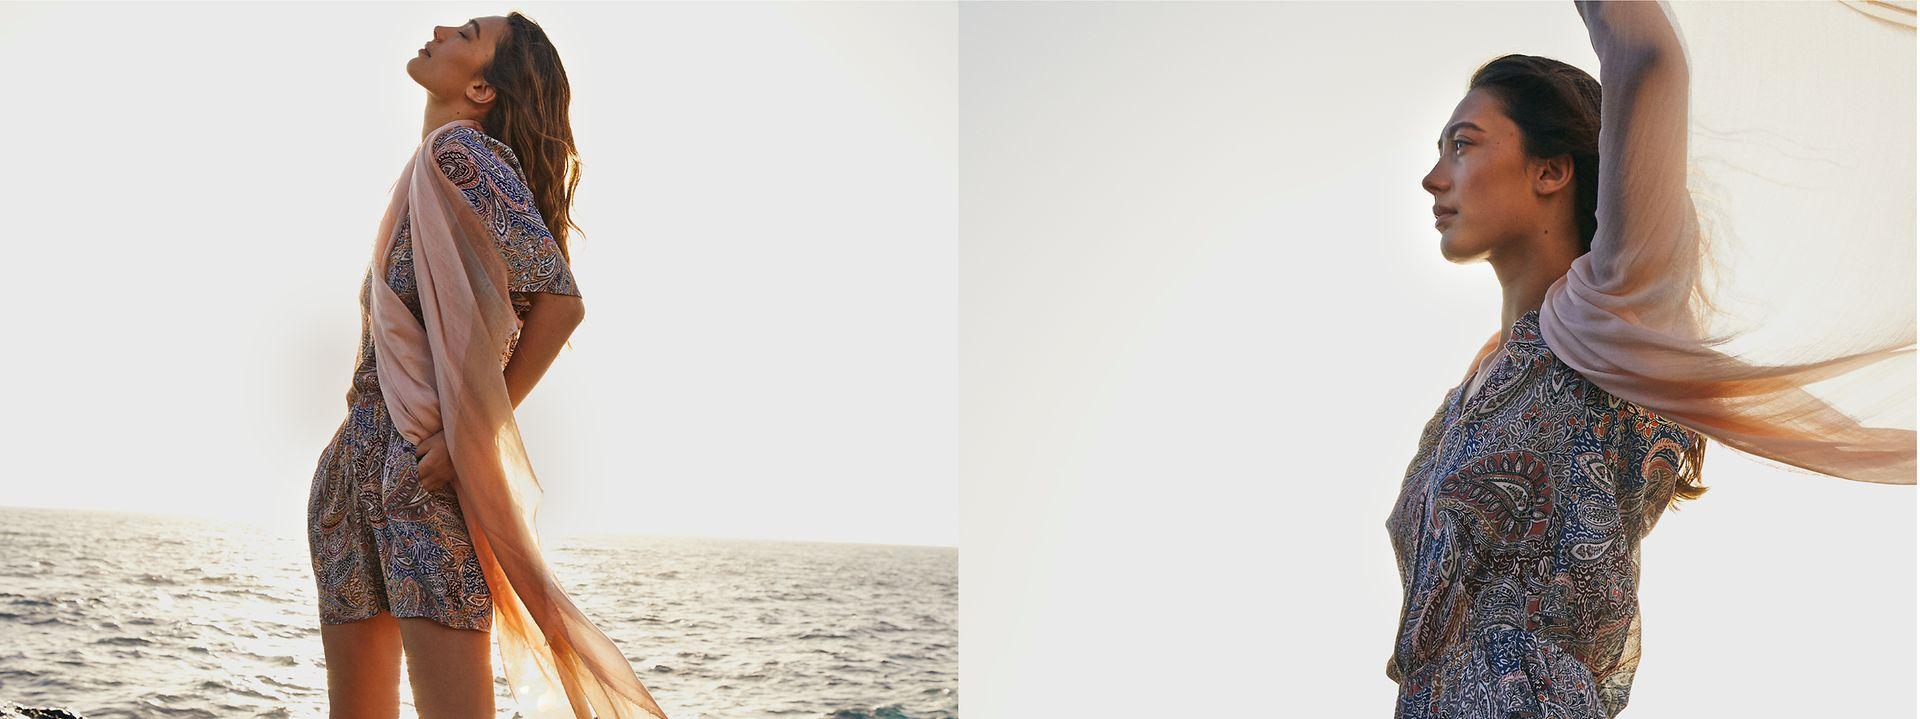 232021 - women - startpage - main banner - holiday - checklist - IMG